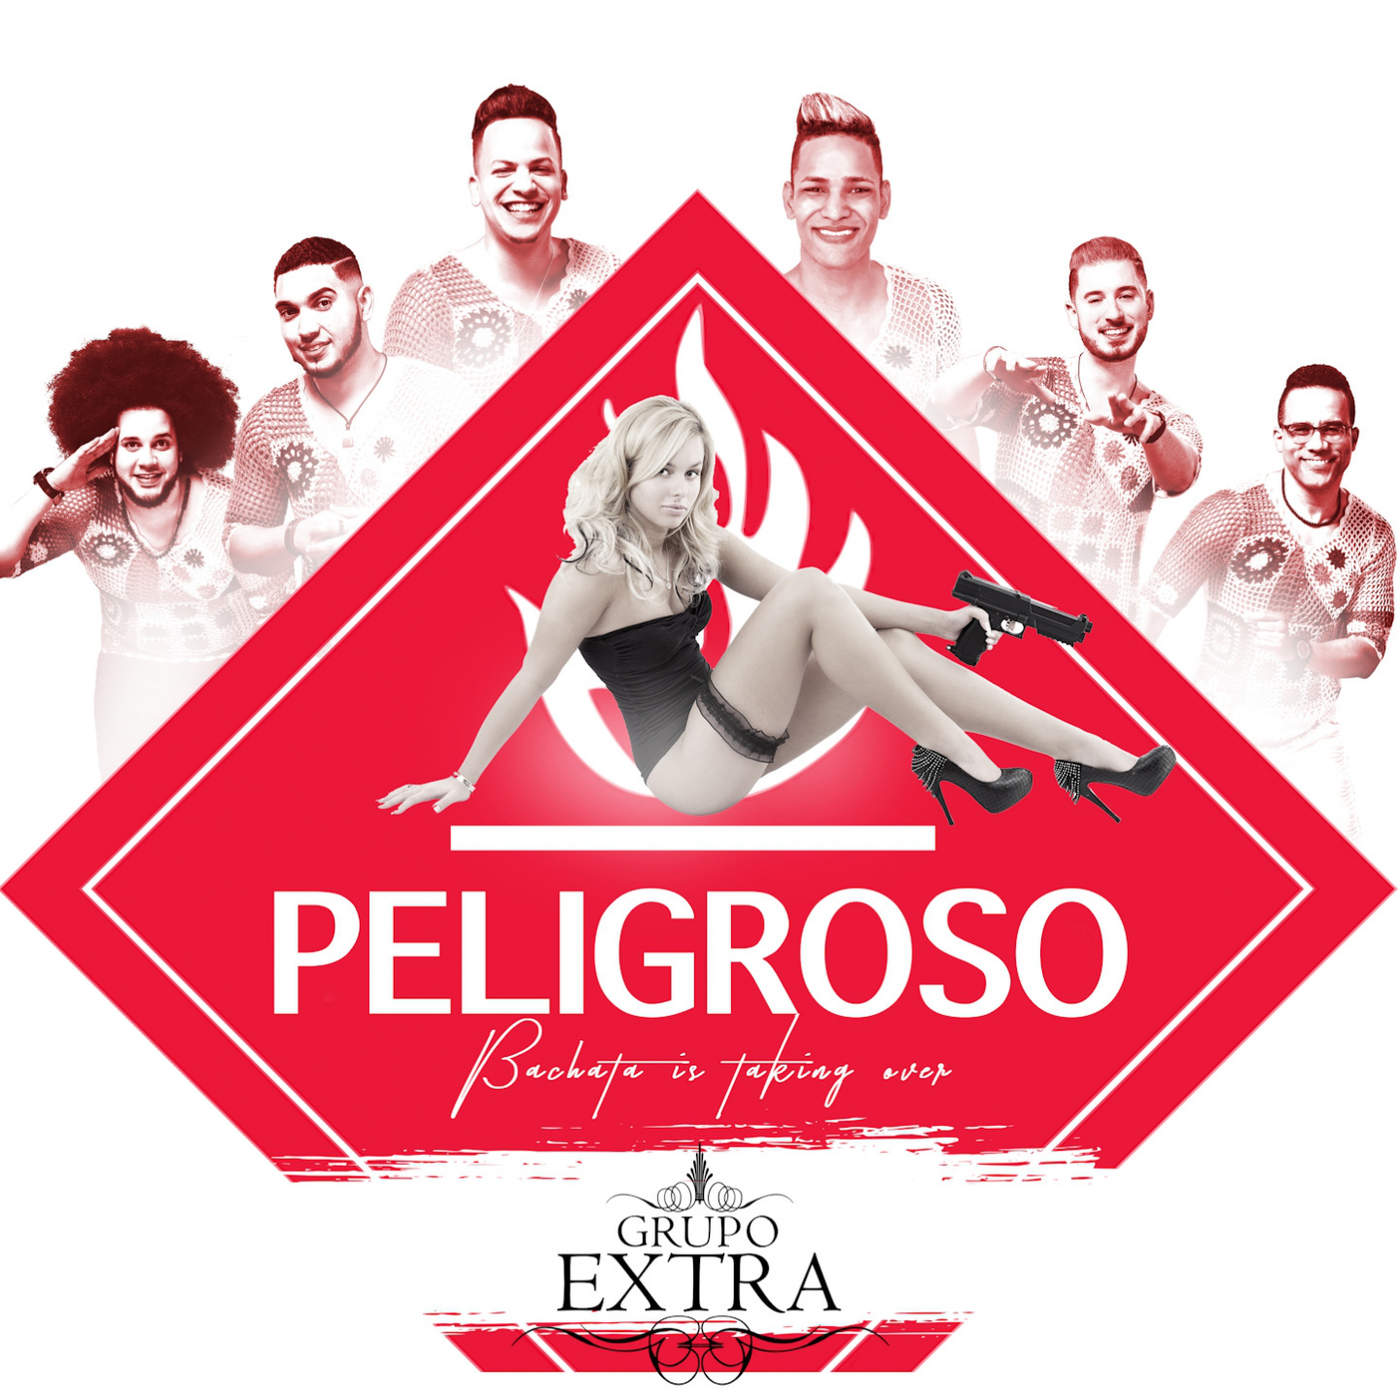 PELIGROSO (BACHATA RADIO EDIT) - THE MOVIE - LA VERDADERA PELICULA